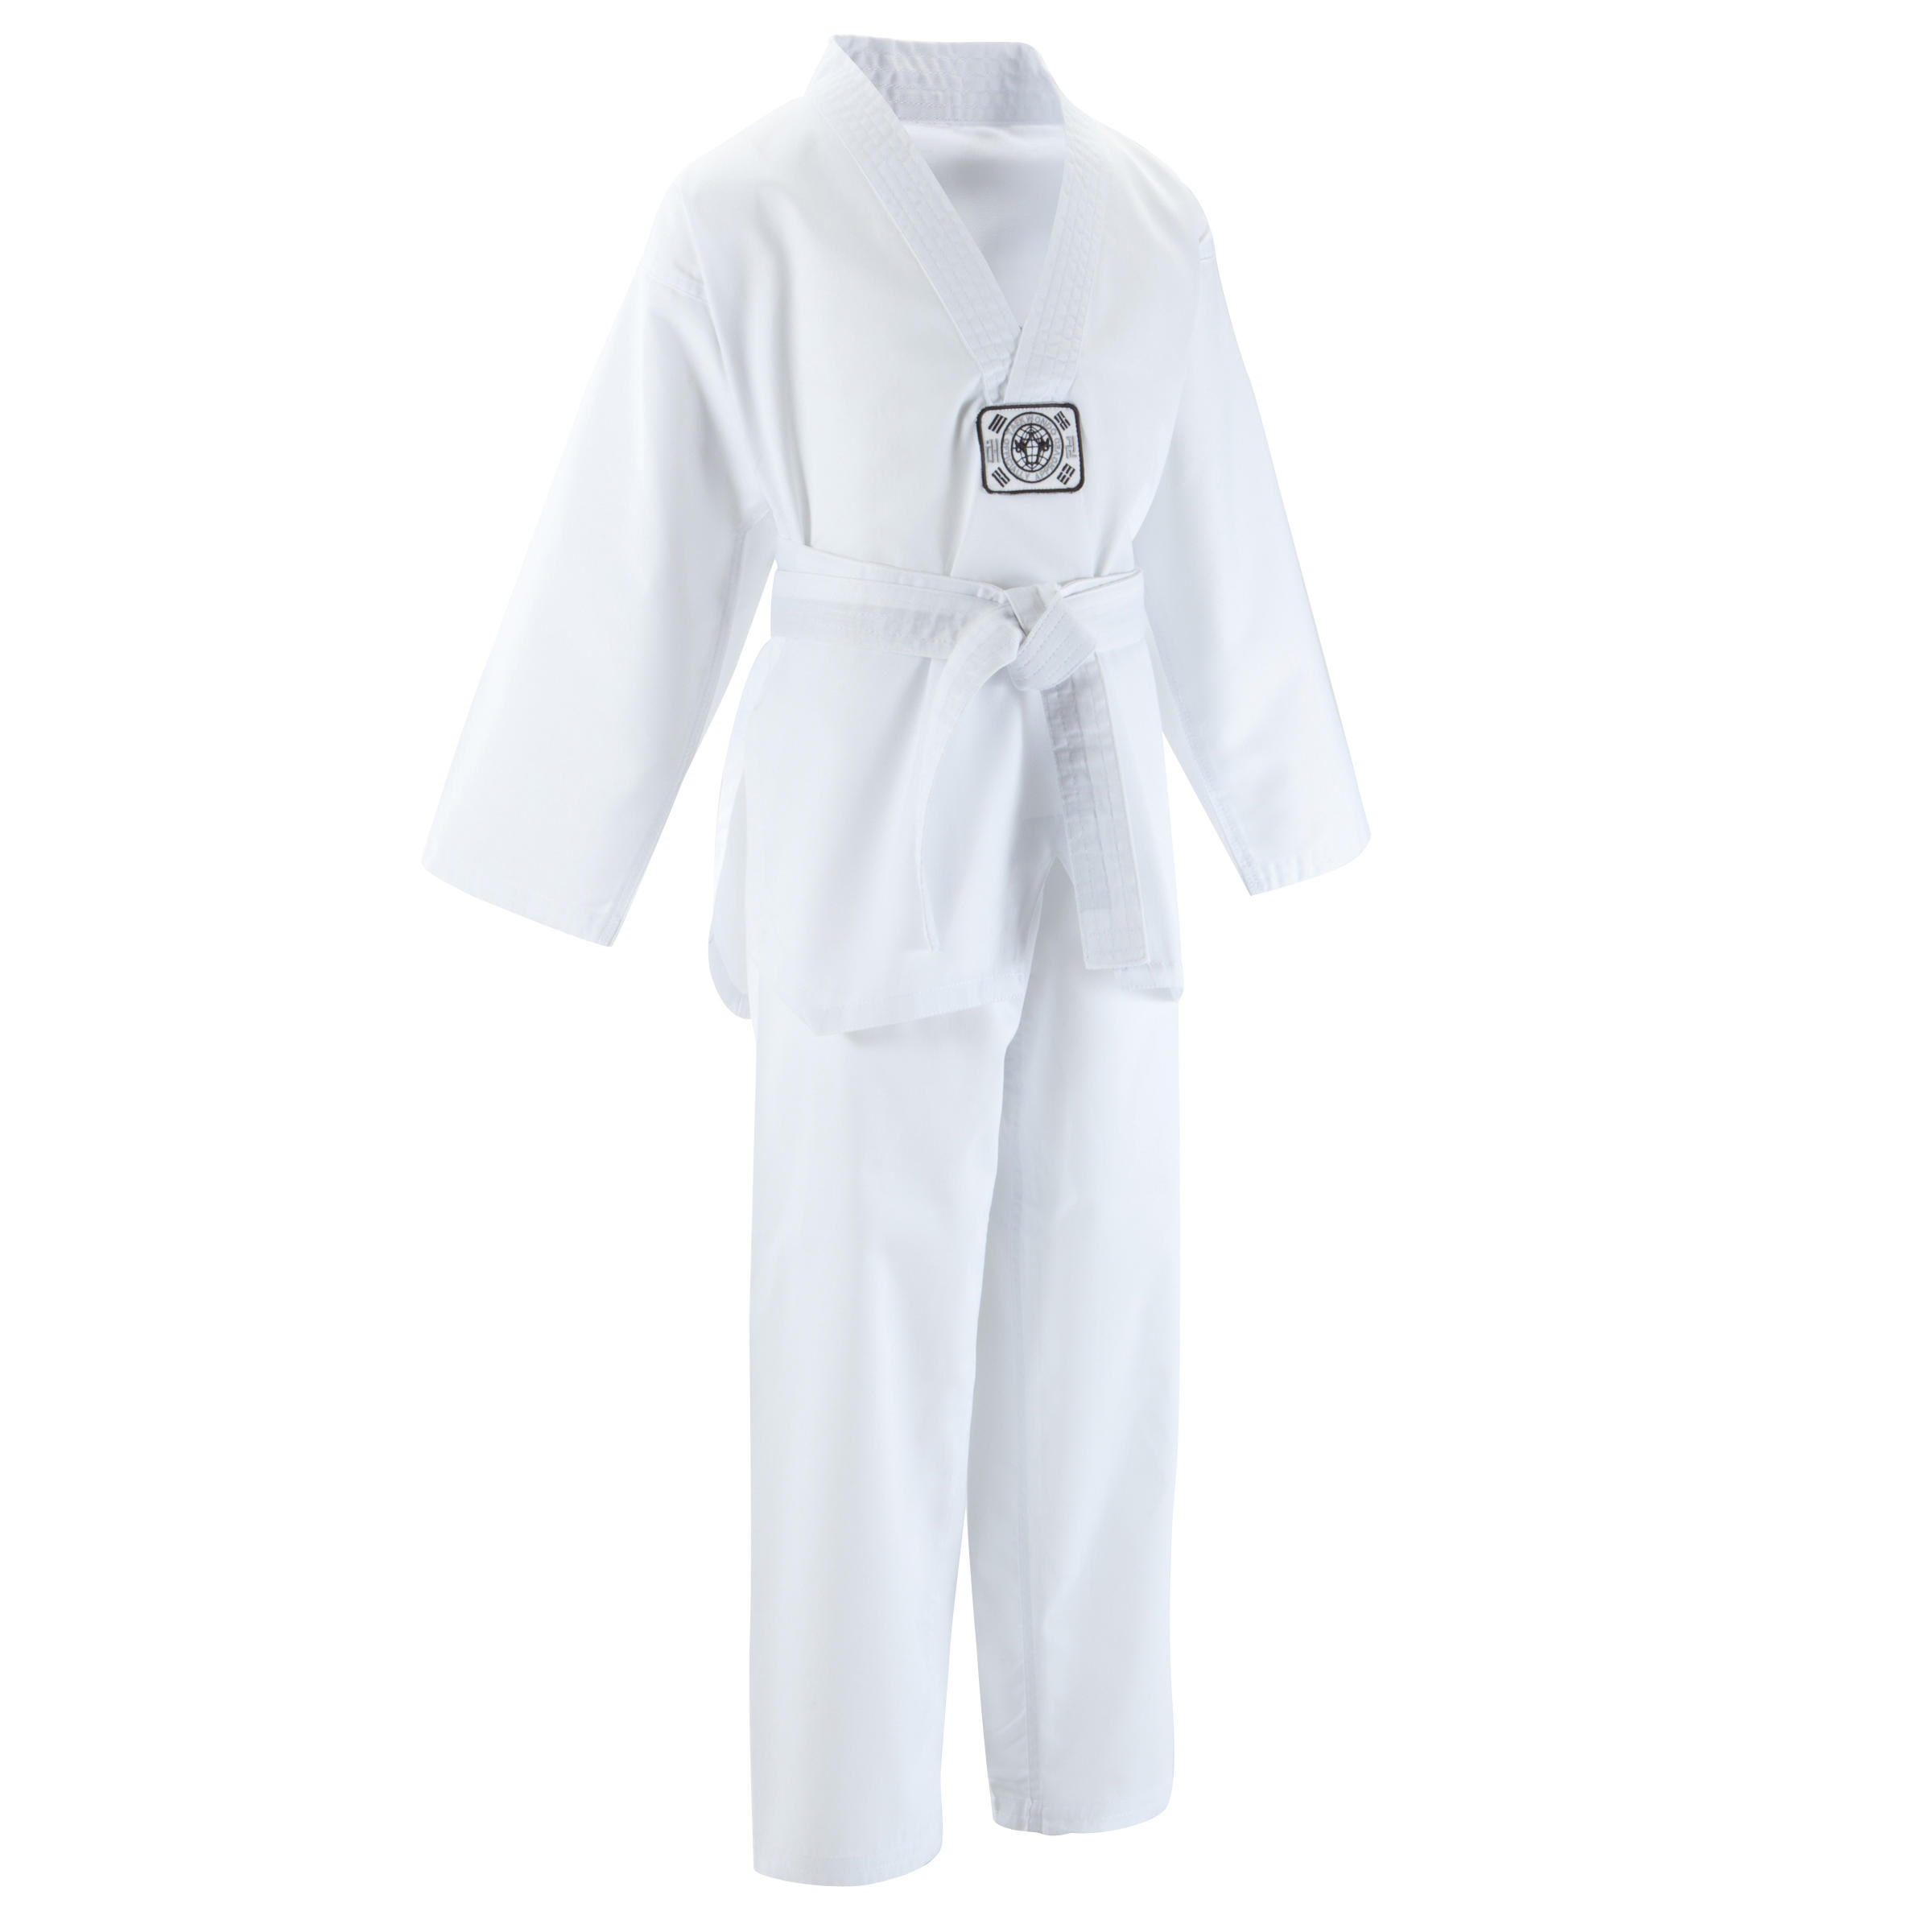 200 Kids' Taekwondo Dobok